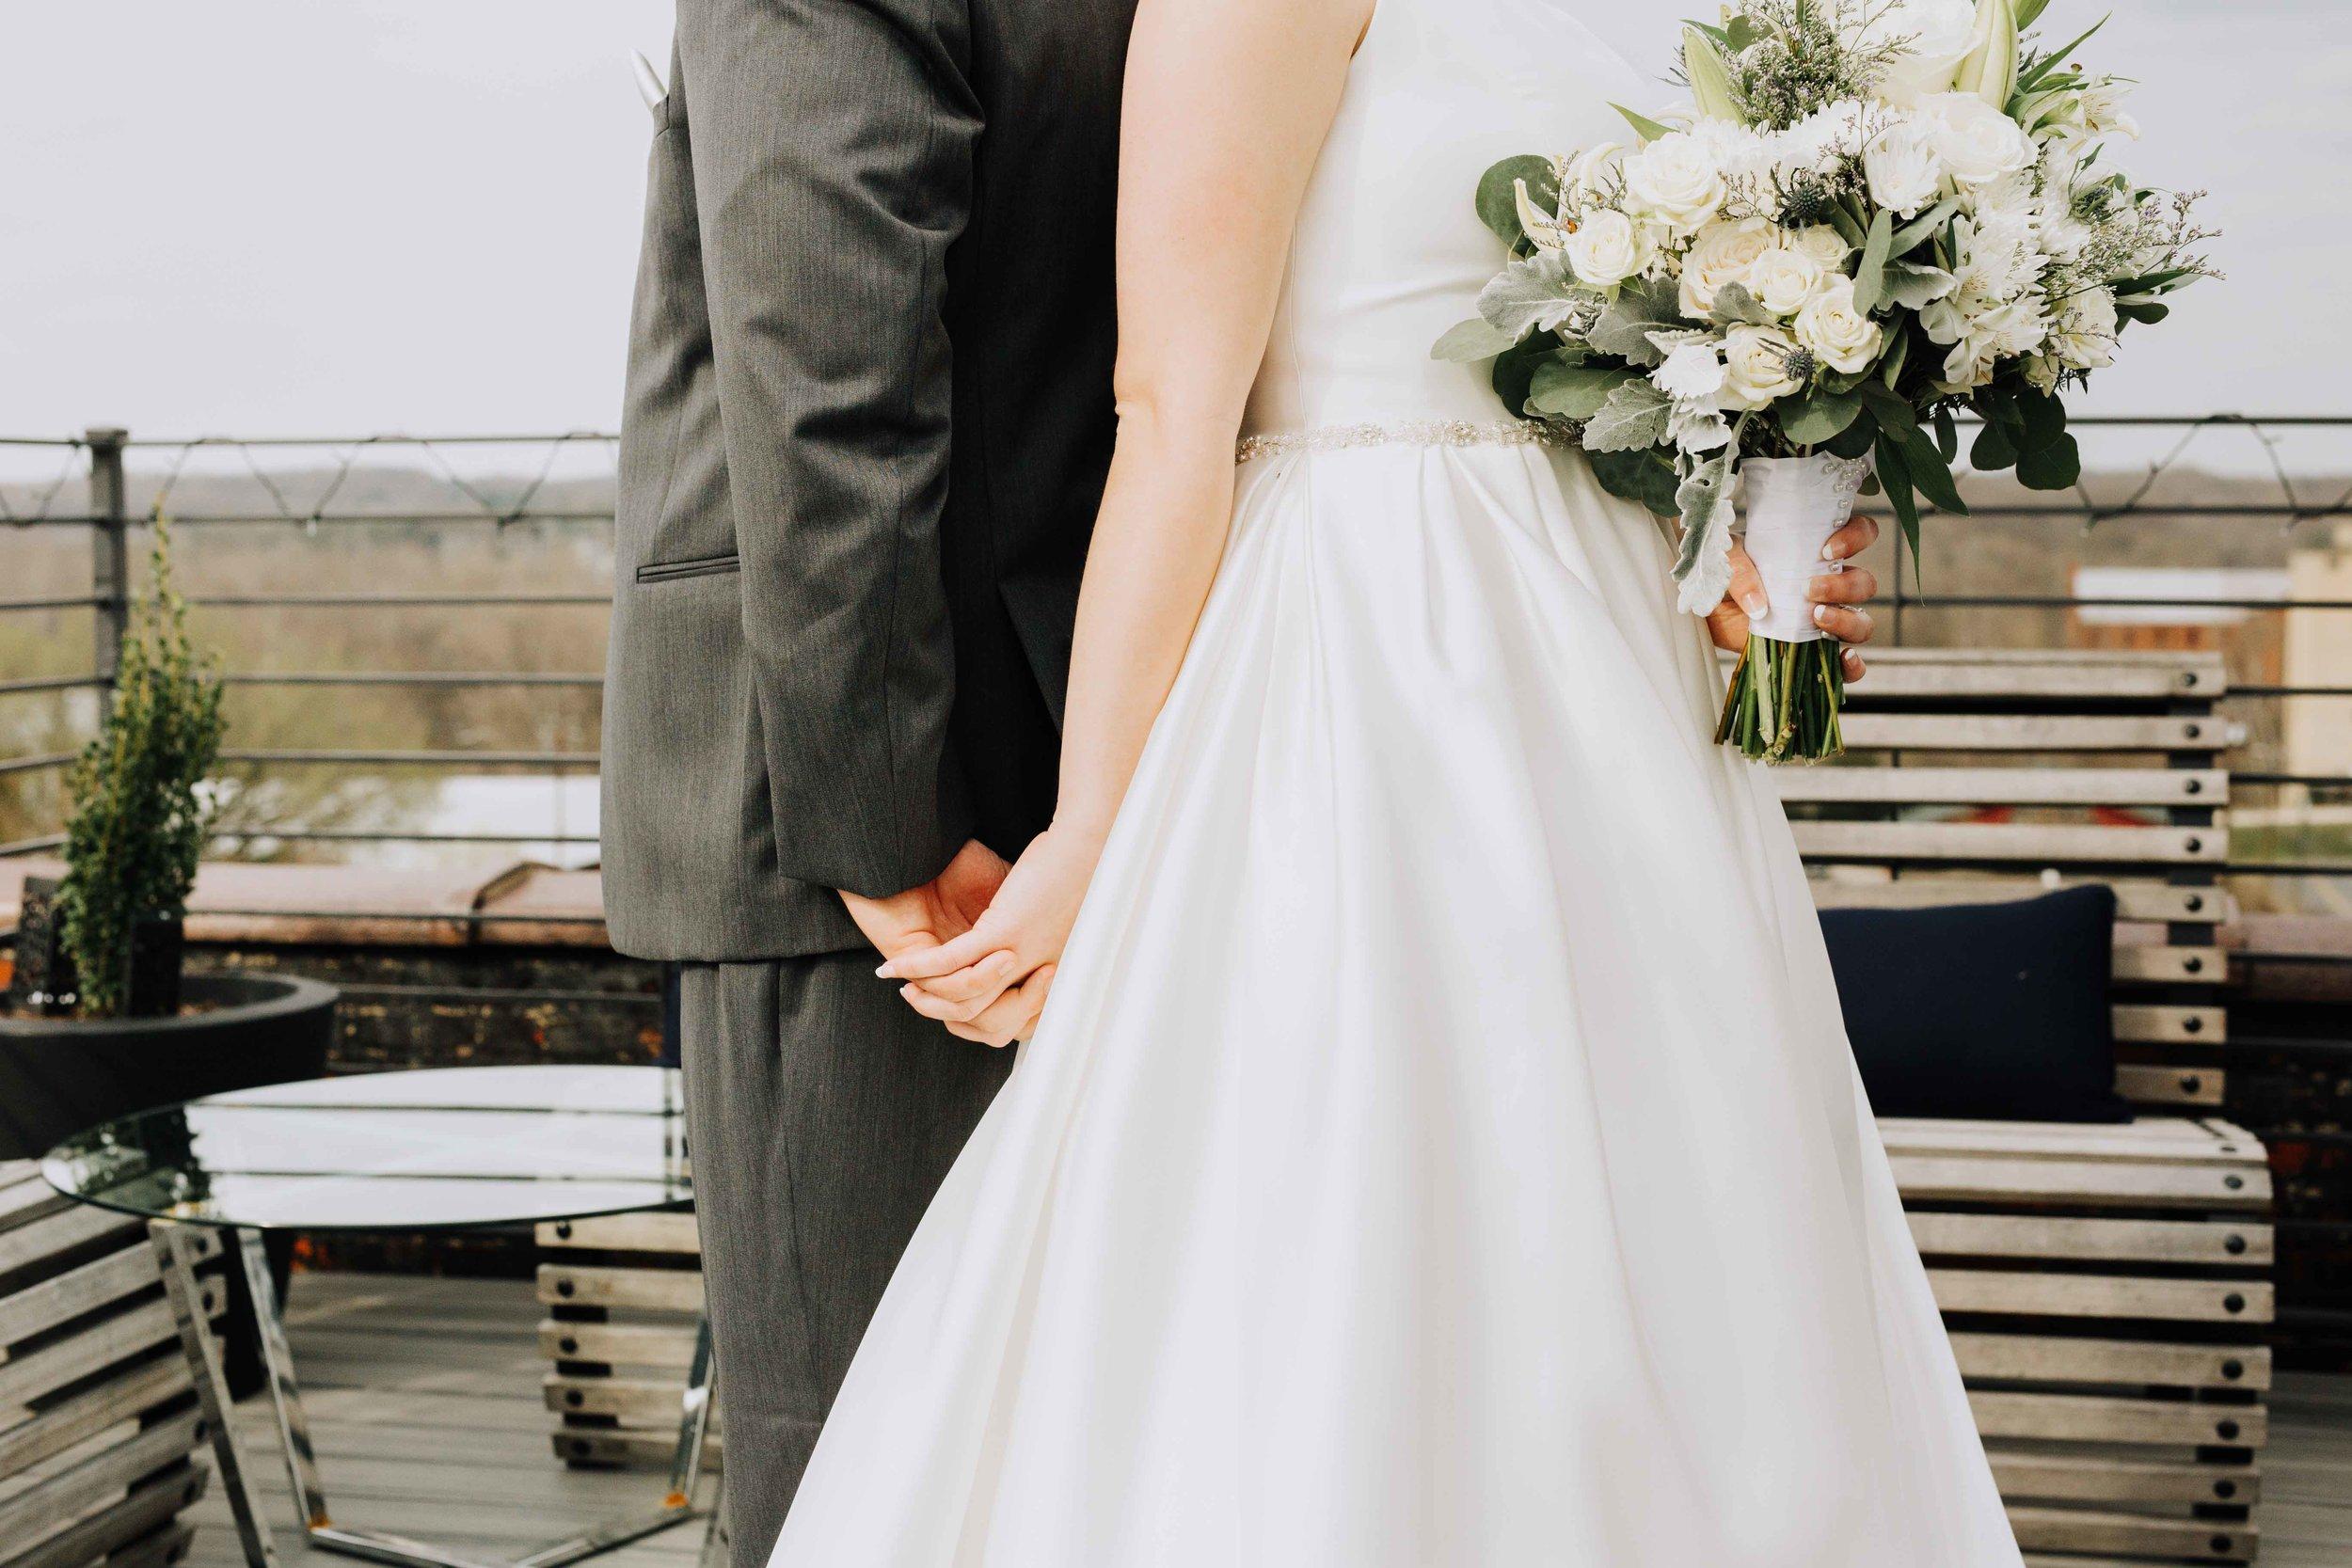 Farmville-Virginia-Wedding-Hotel-Weynoke-Downtown-Jacqueline-Waters-Photography-Detailed- (505).jpg